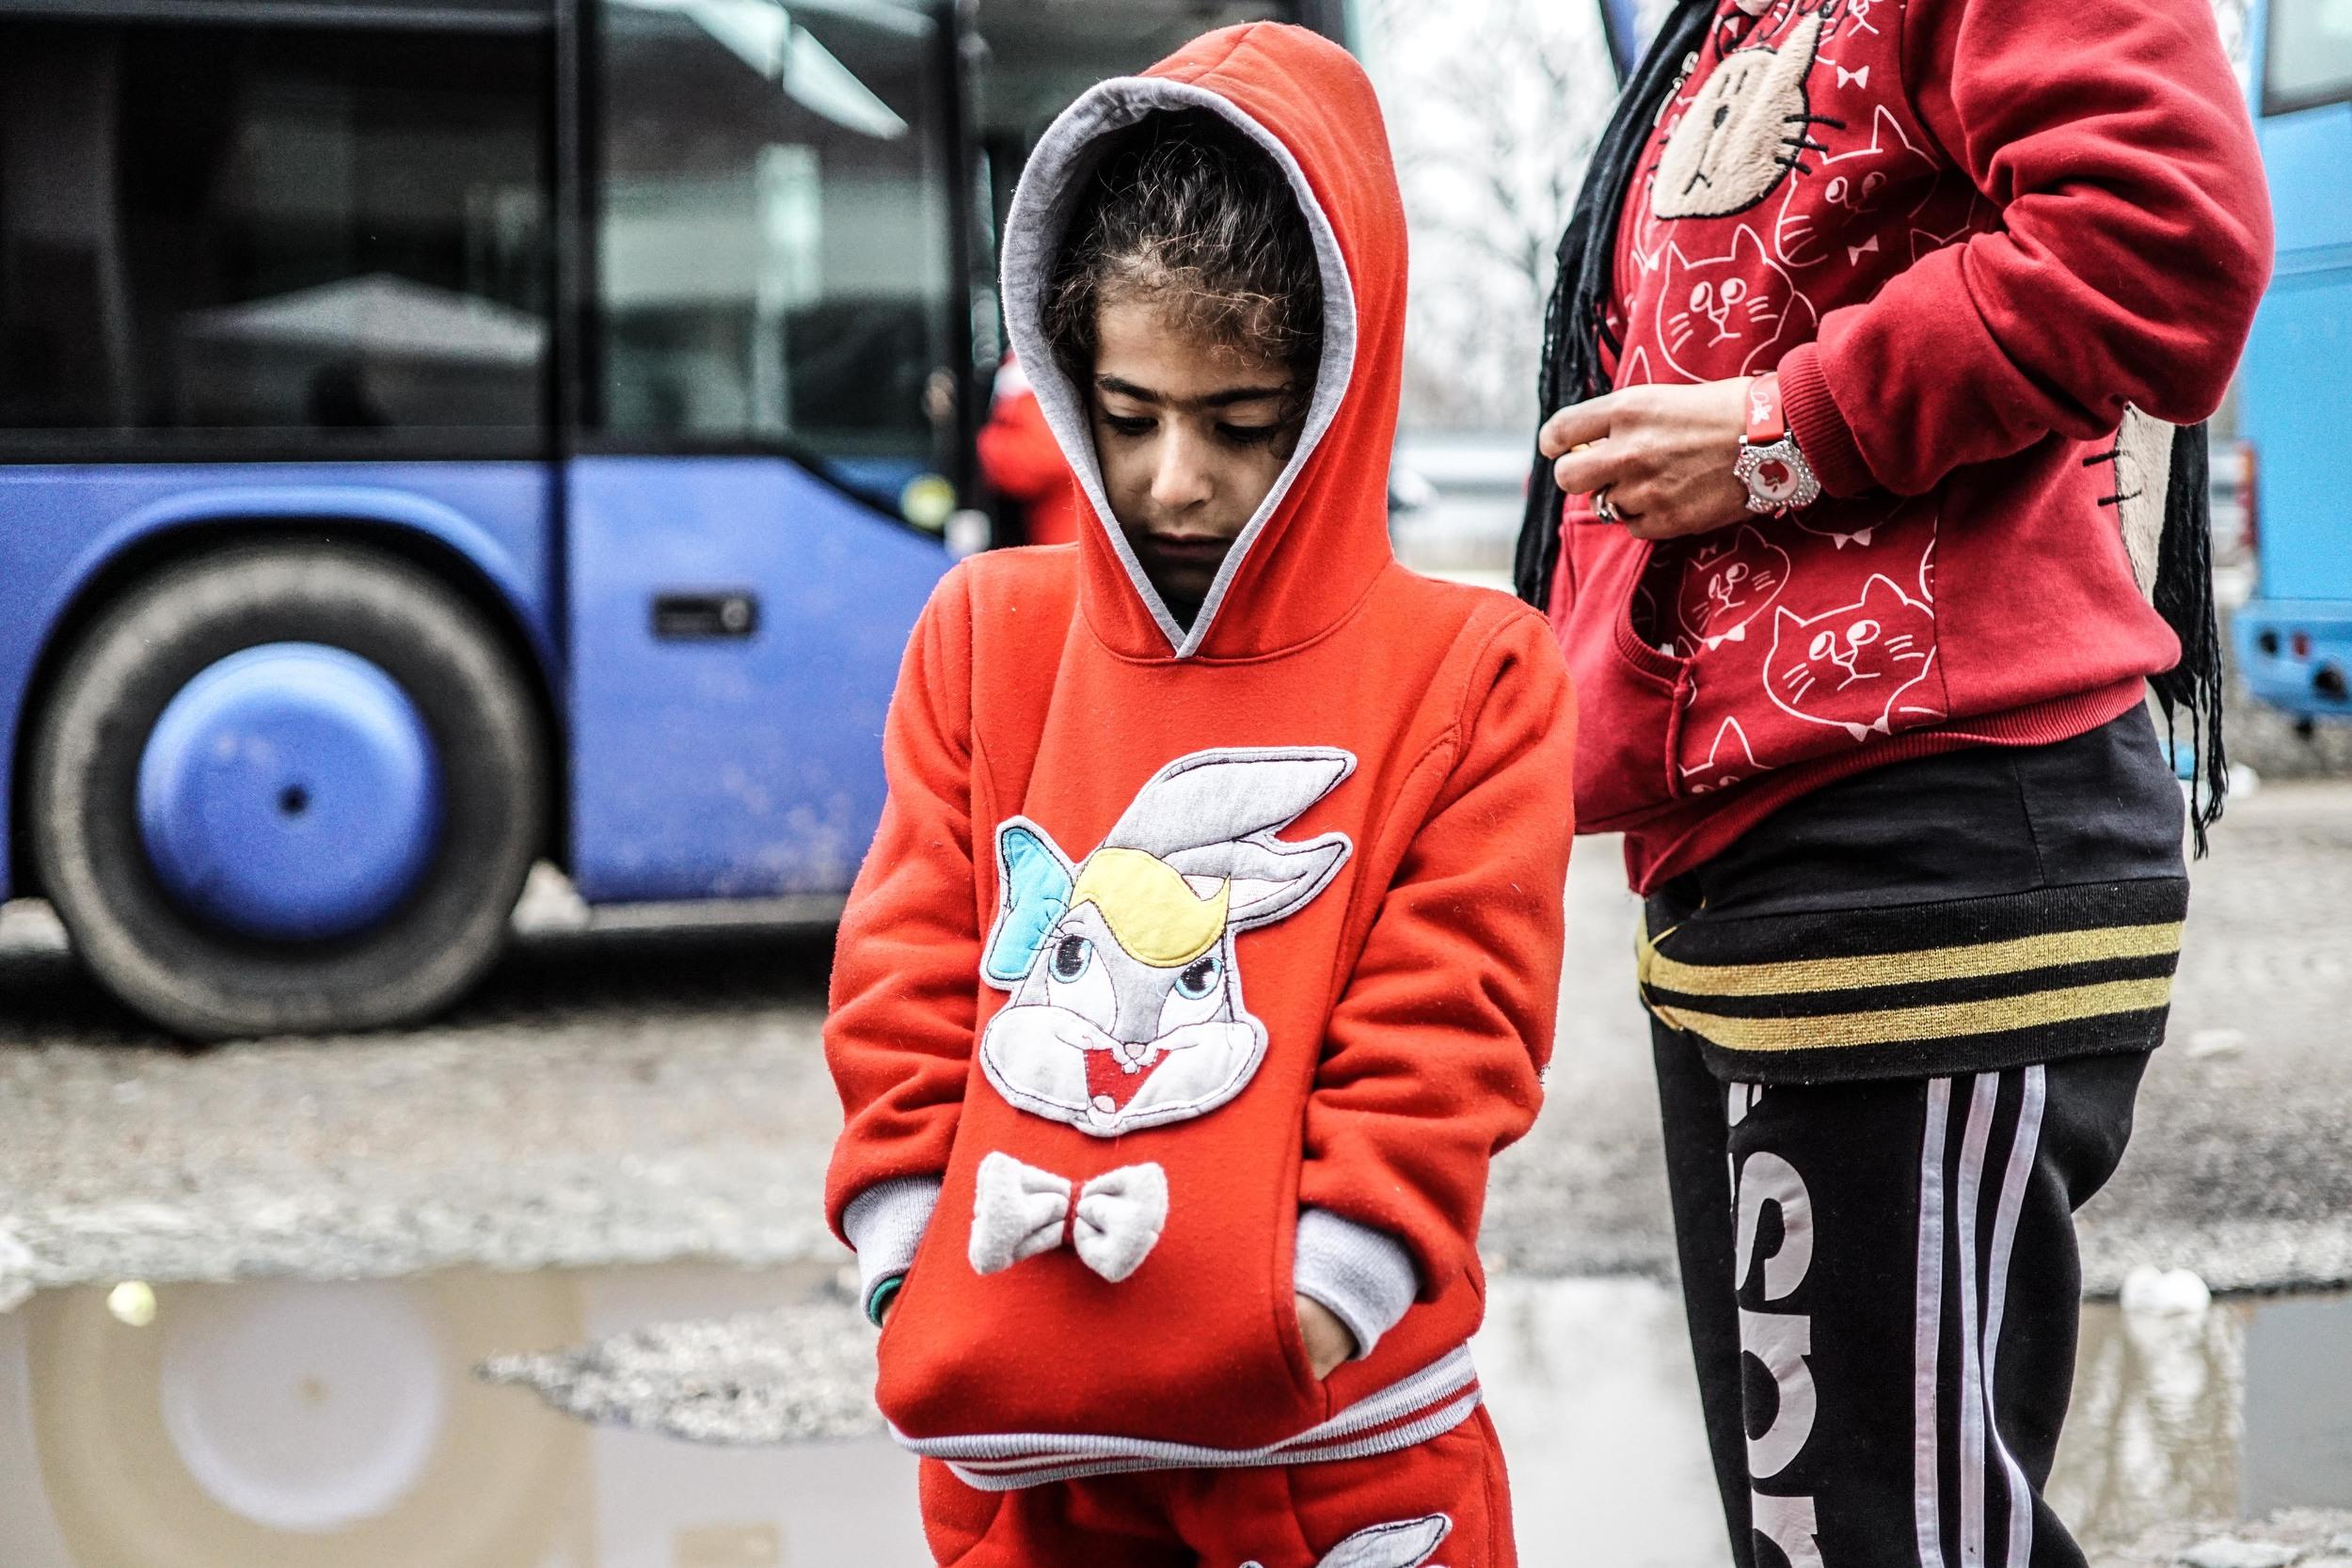 Syrian Refugee Crisis Serbia November 2015 22.jpg